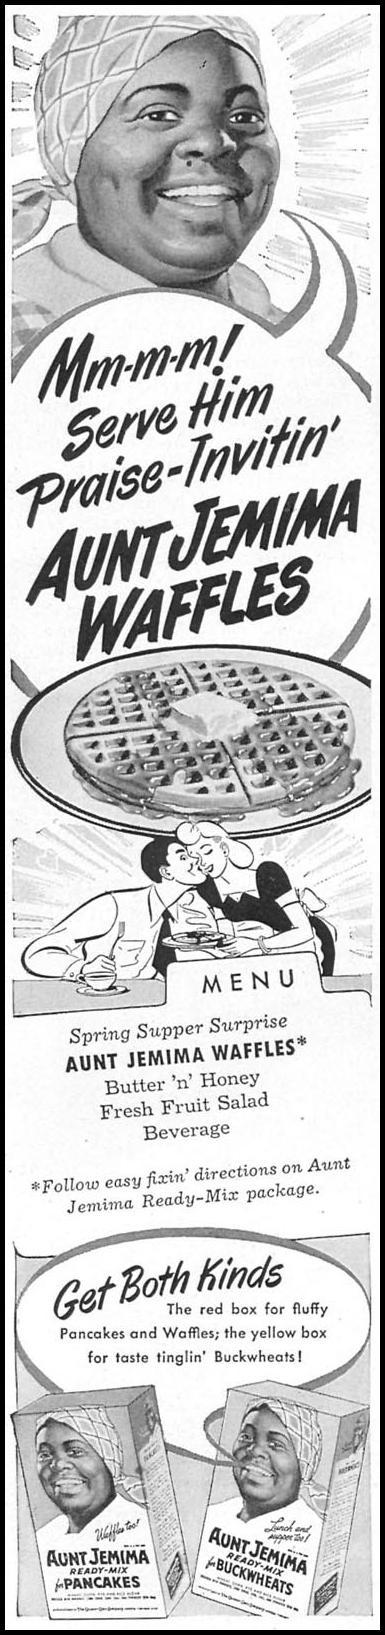 AUNT JEMIMA PANCAKES WOMAN'S DAY 04/01/1949 p. 90